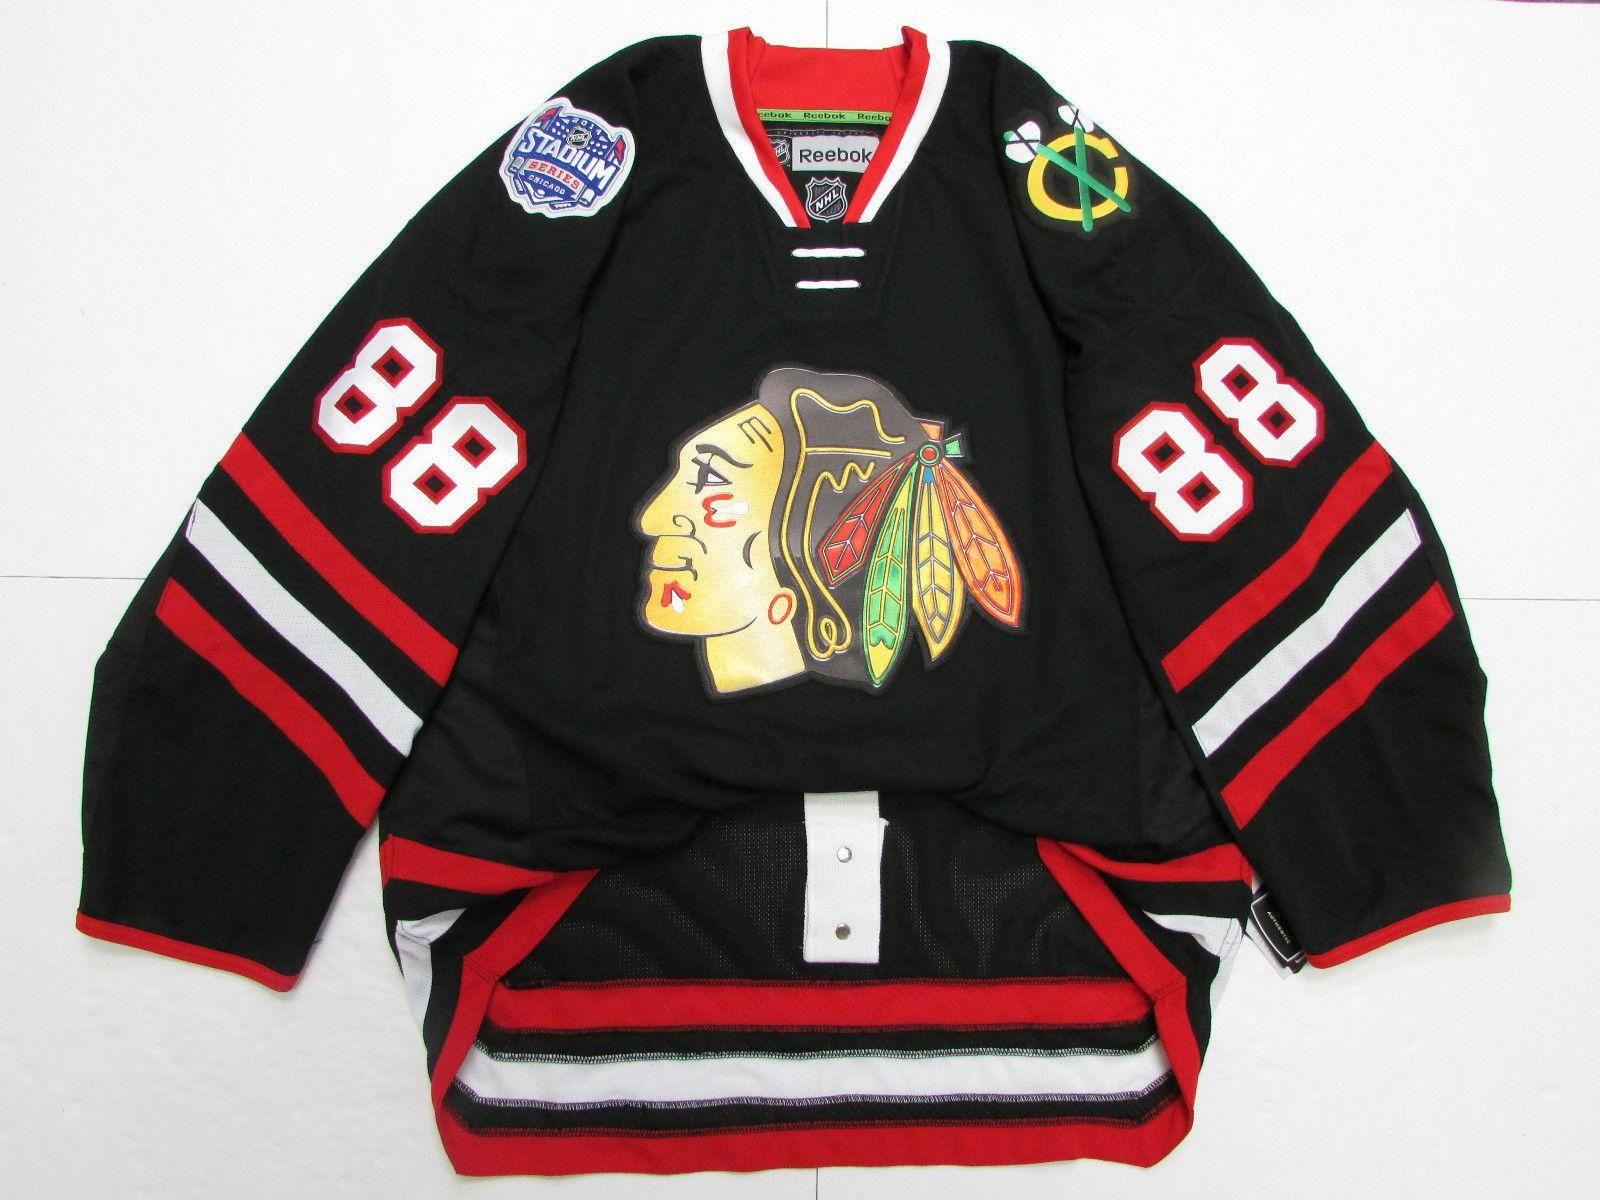 0b497adca01 2019 Cheap Custom KANE CHICAGO BLACKHAWKS 2014 STADIUM SERIES JERSEY Stitch  Add Any Number Any Name Mens Hockey Jersey XS 5XL From Custom_nbajersey, ...